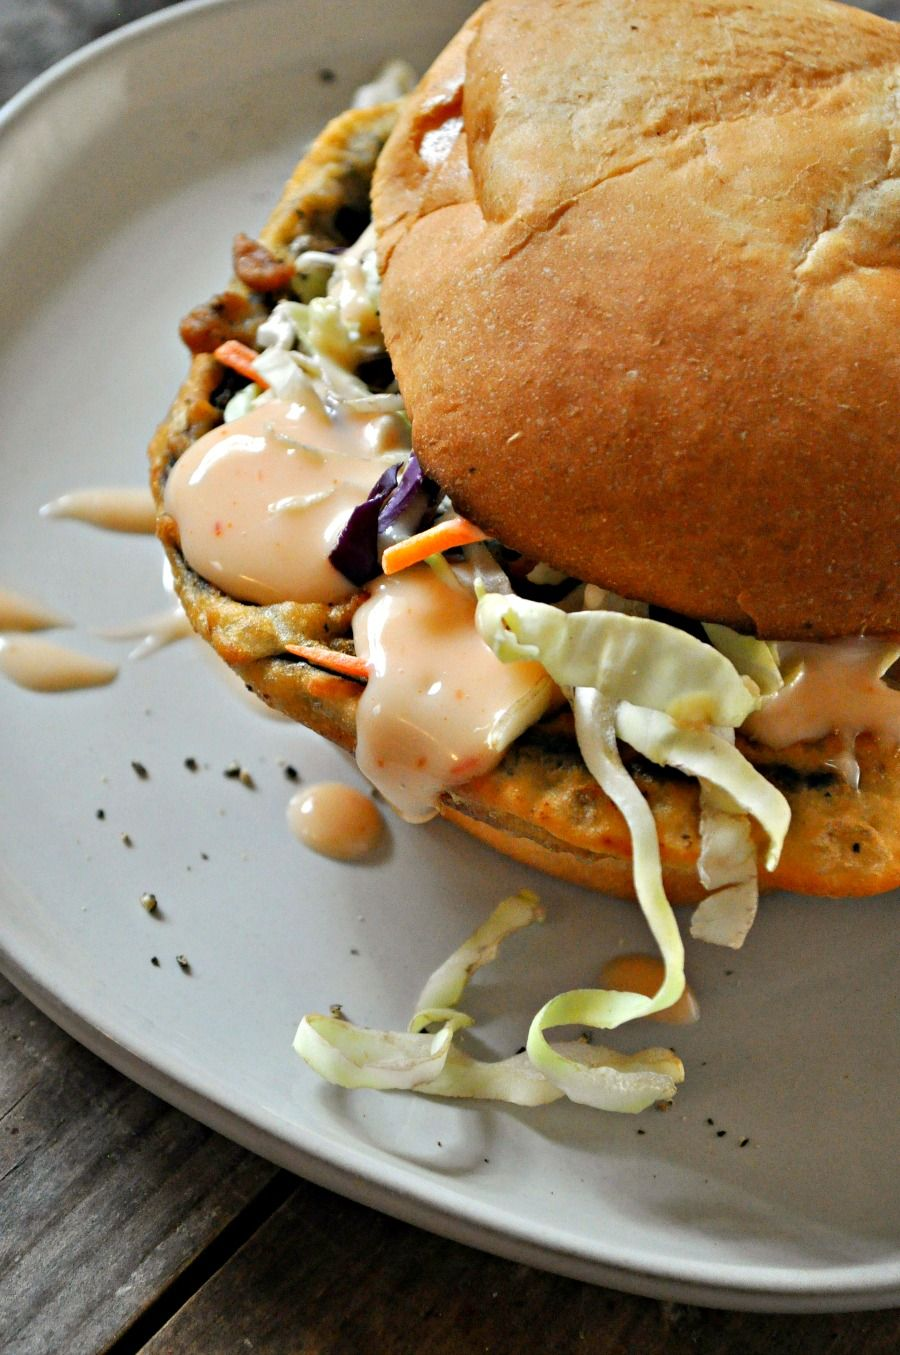 Vegan Buttermilk Fried Mushroom Sandwiches